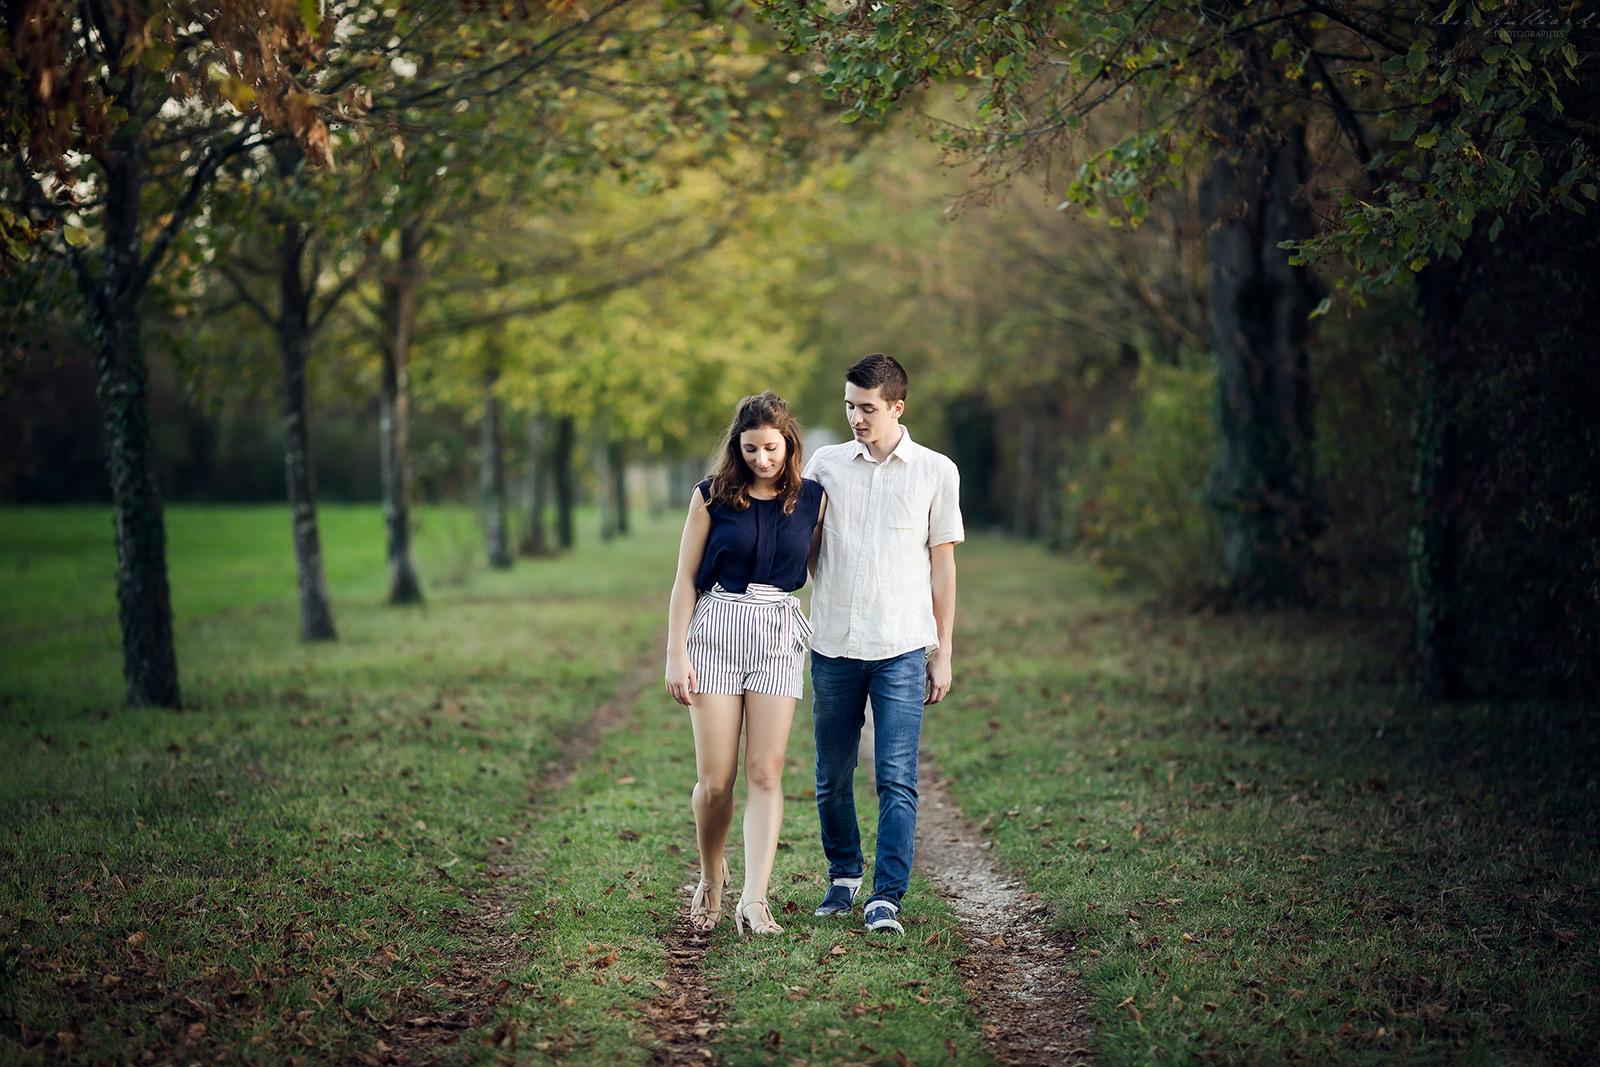 seance-photo-engagement-photographe-mariage-reportage-couple-lyon-auvergne-rhone-alpes-haute-savoie-isere-love-session-elise-julliard-wedding-photographer-11